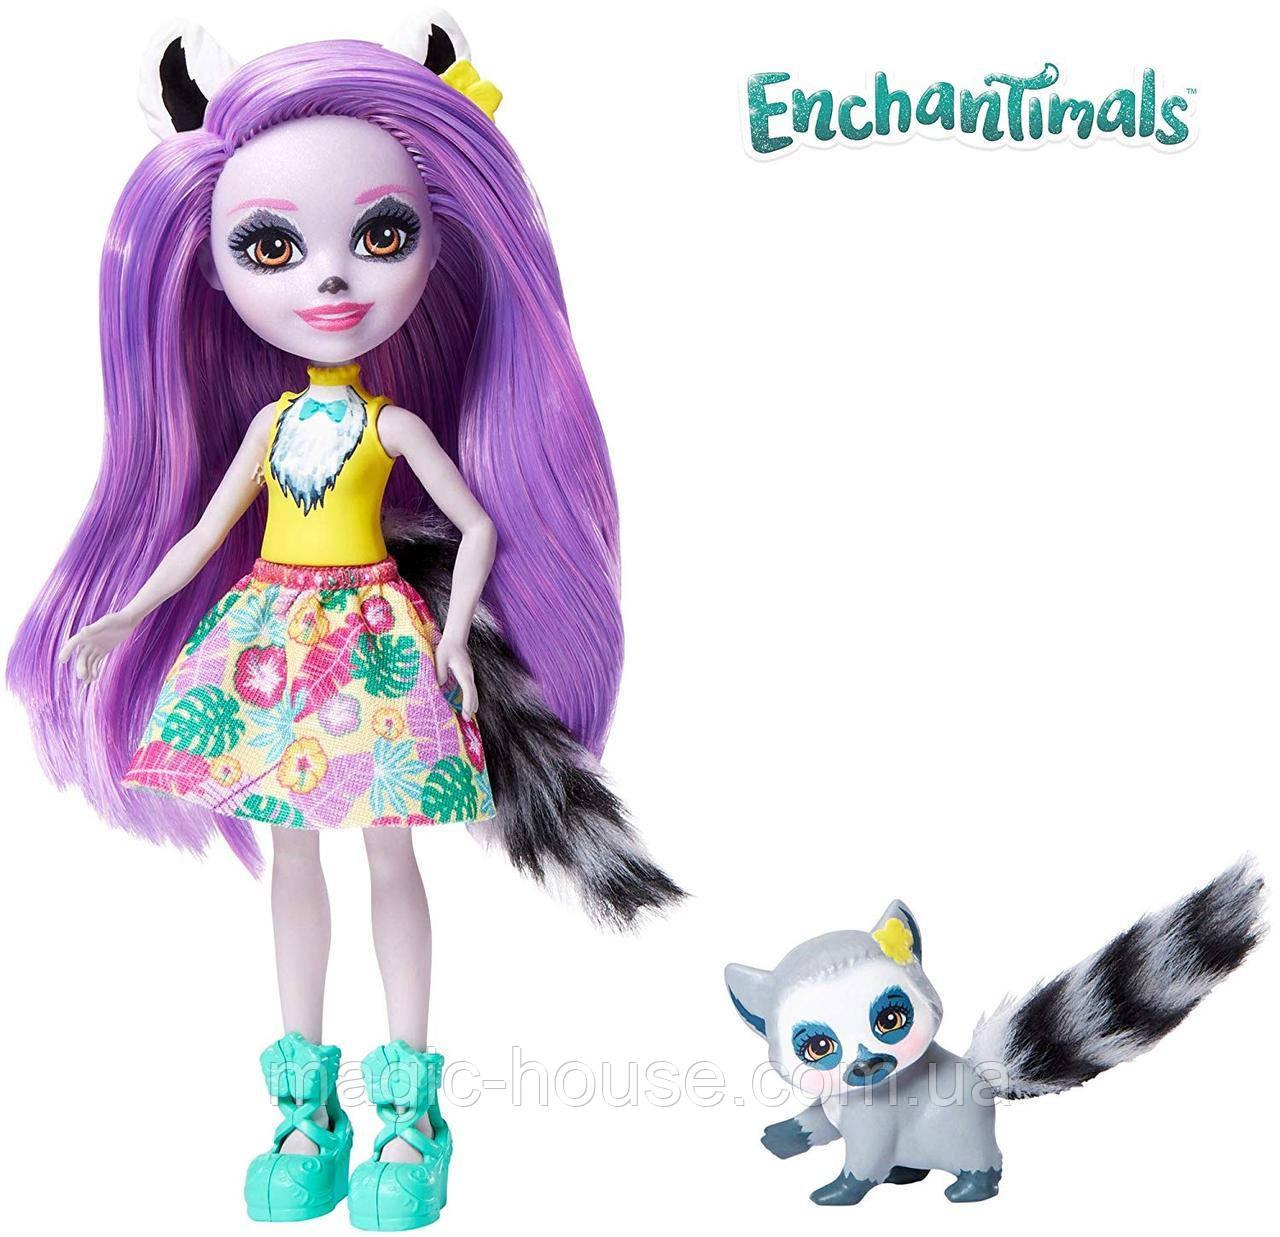 Лялька Энчантималси Лариса Лемур і один Ринглет Mattel Enchantimals Larissa Lemur & Ringlet